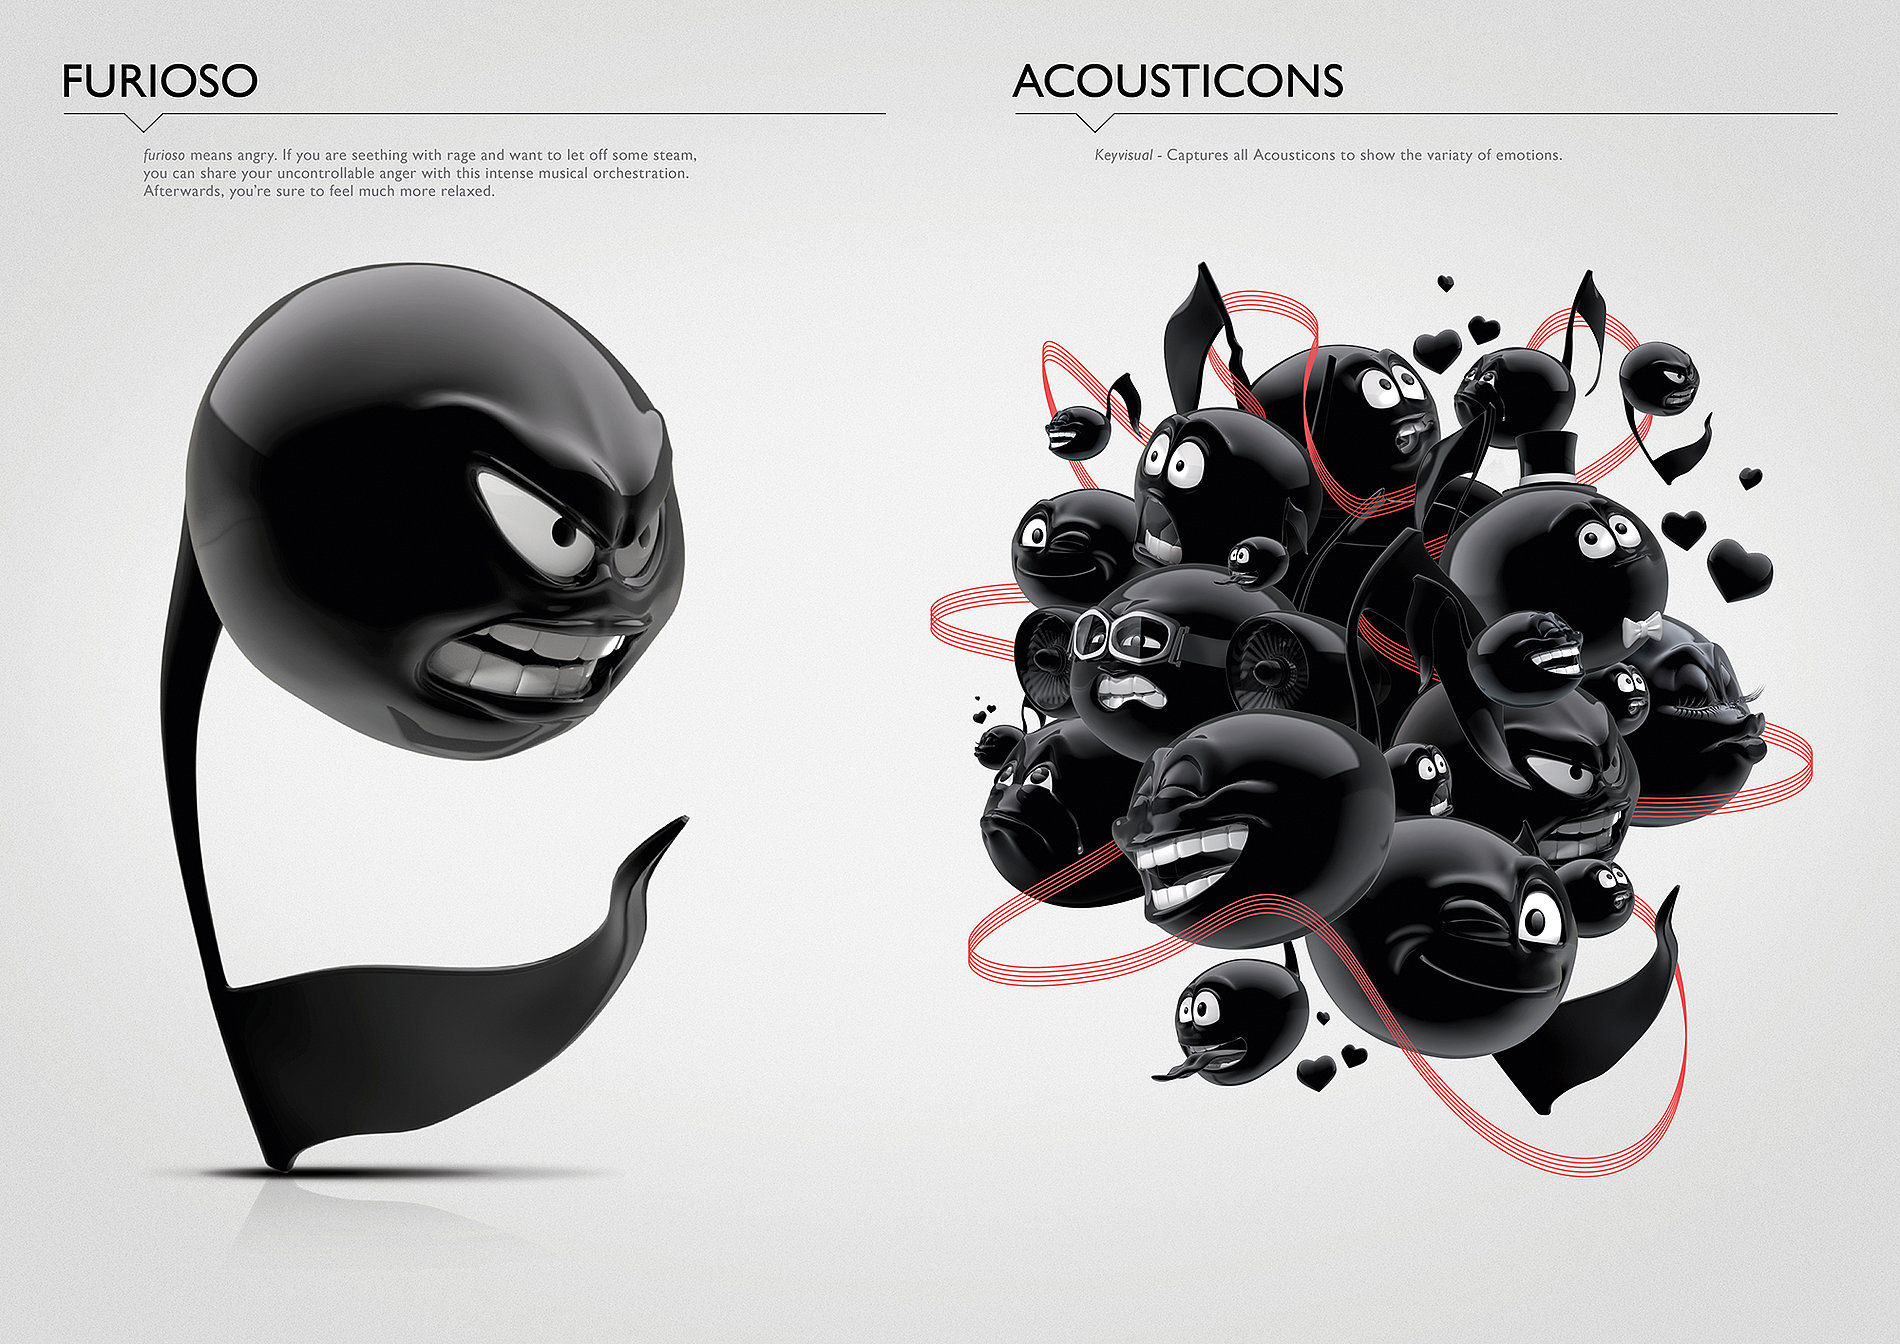 Acousticons | Red Dot Design Award